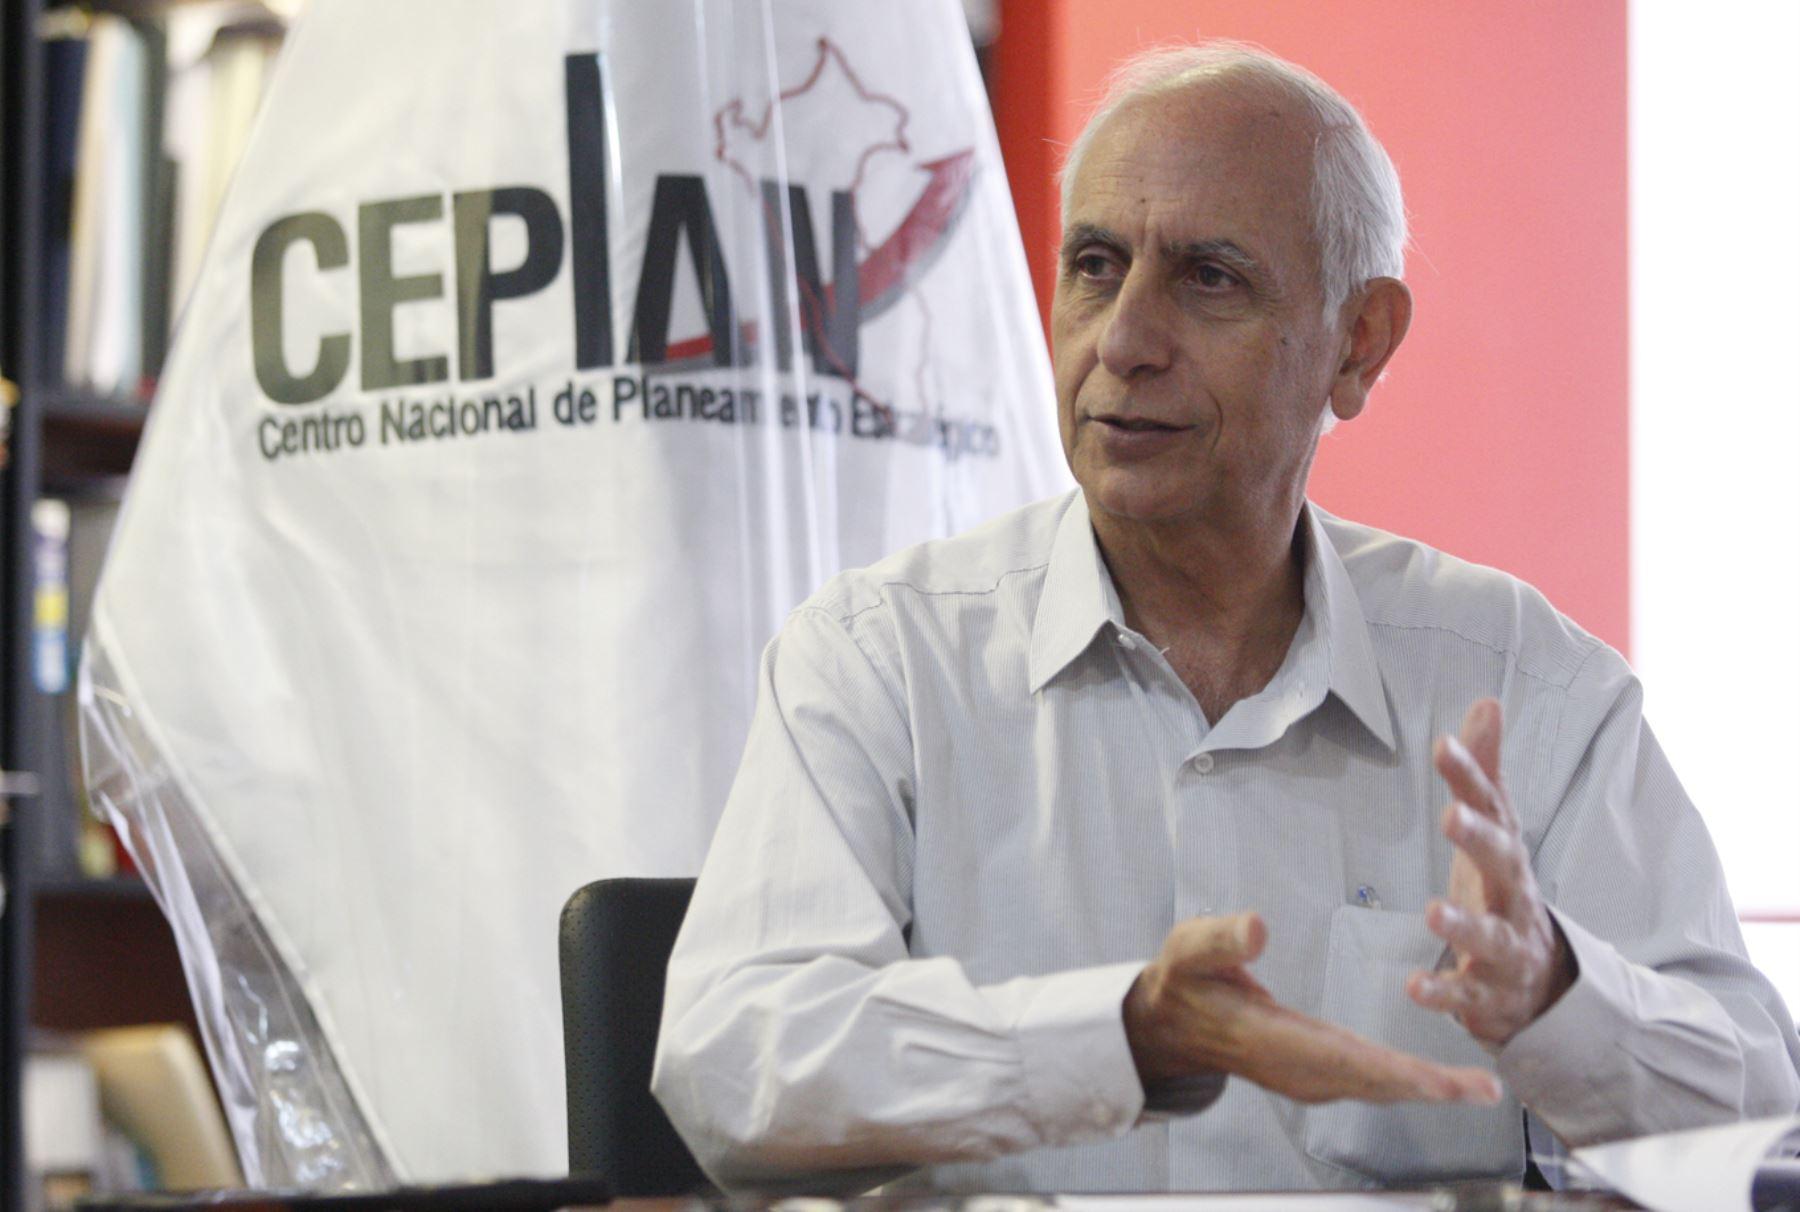 Presidente de Ceplan, Javier Abugattás. ANDINA/Eddy Ramos